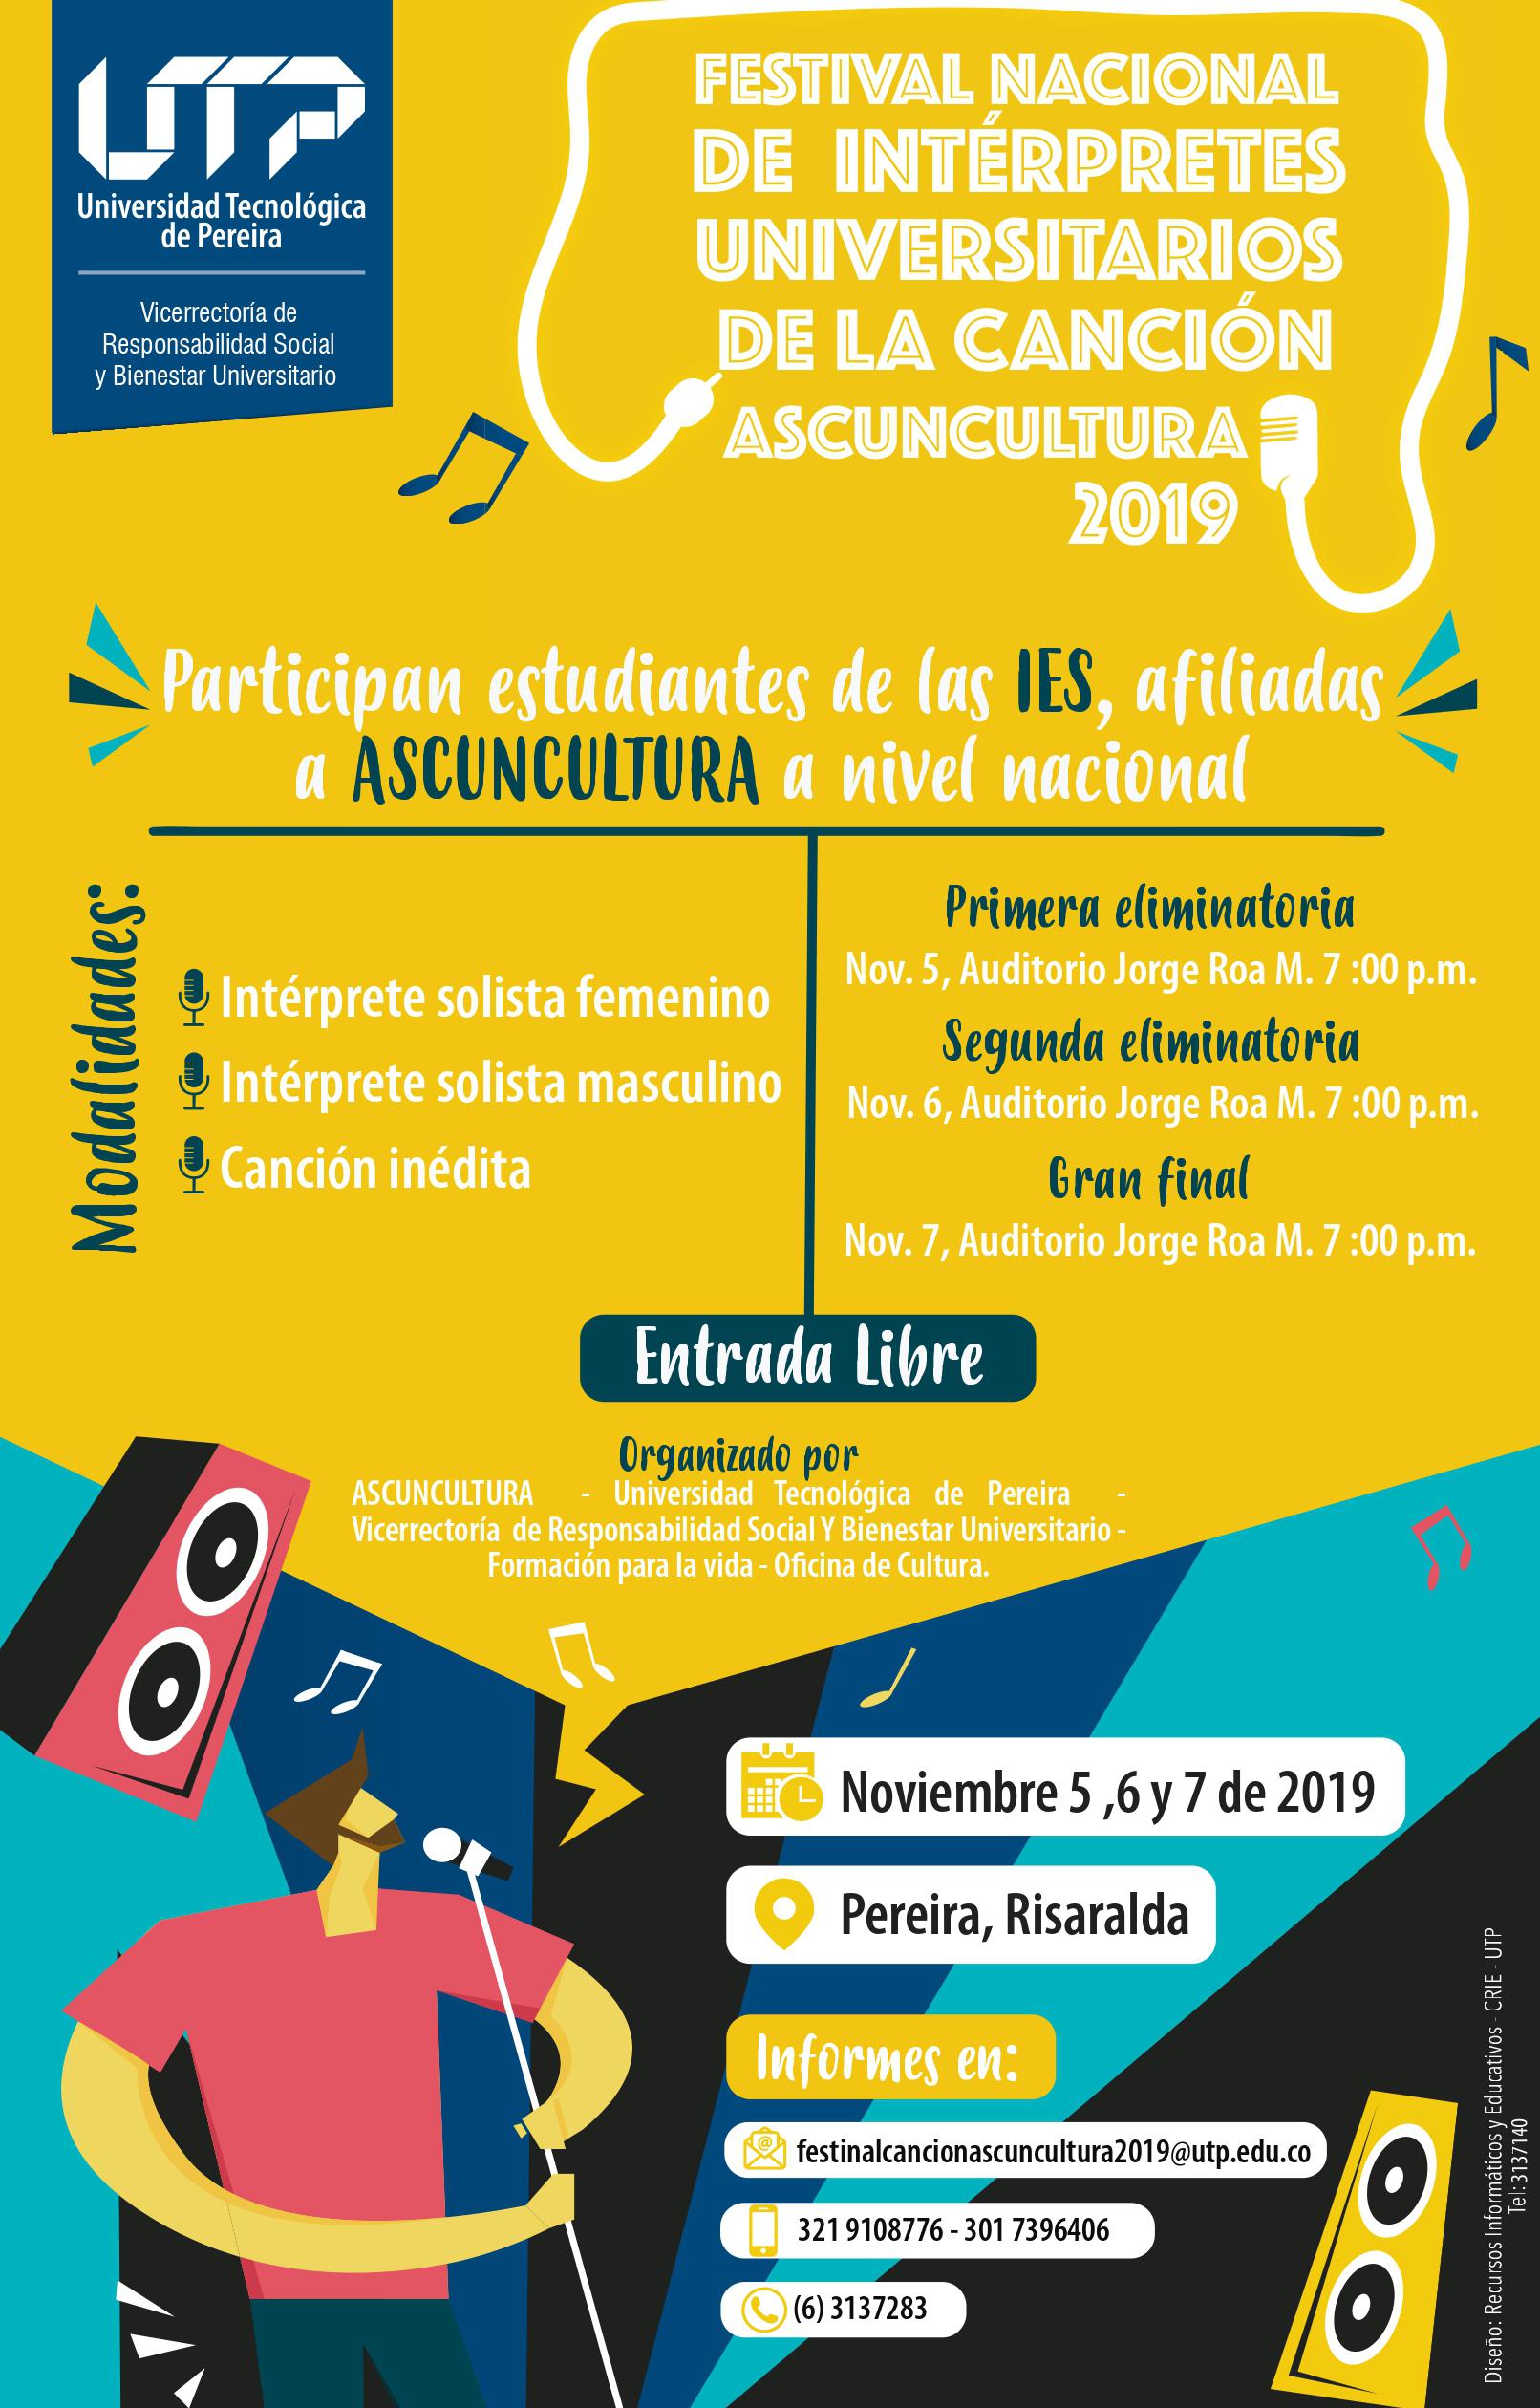 Festival Nacional de la Canción ASCUNCULTURA 2019